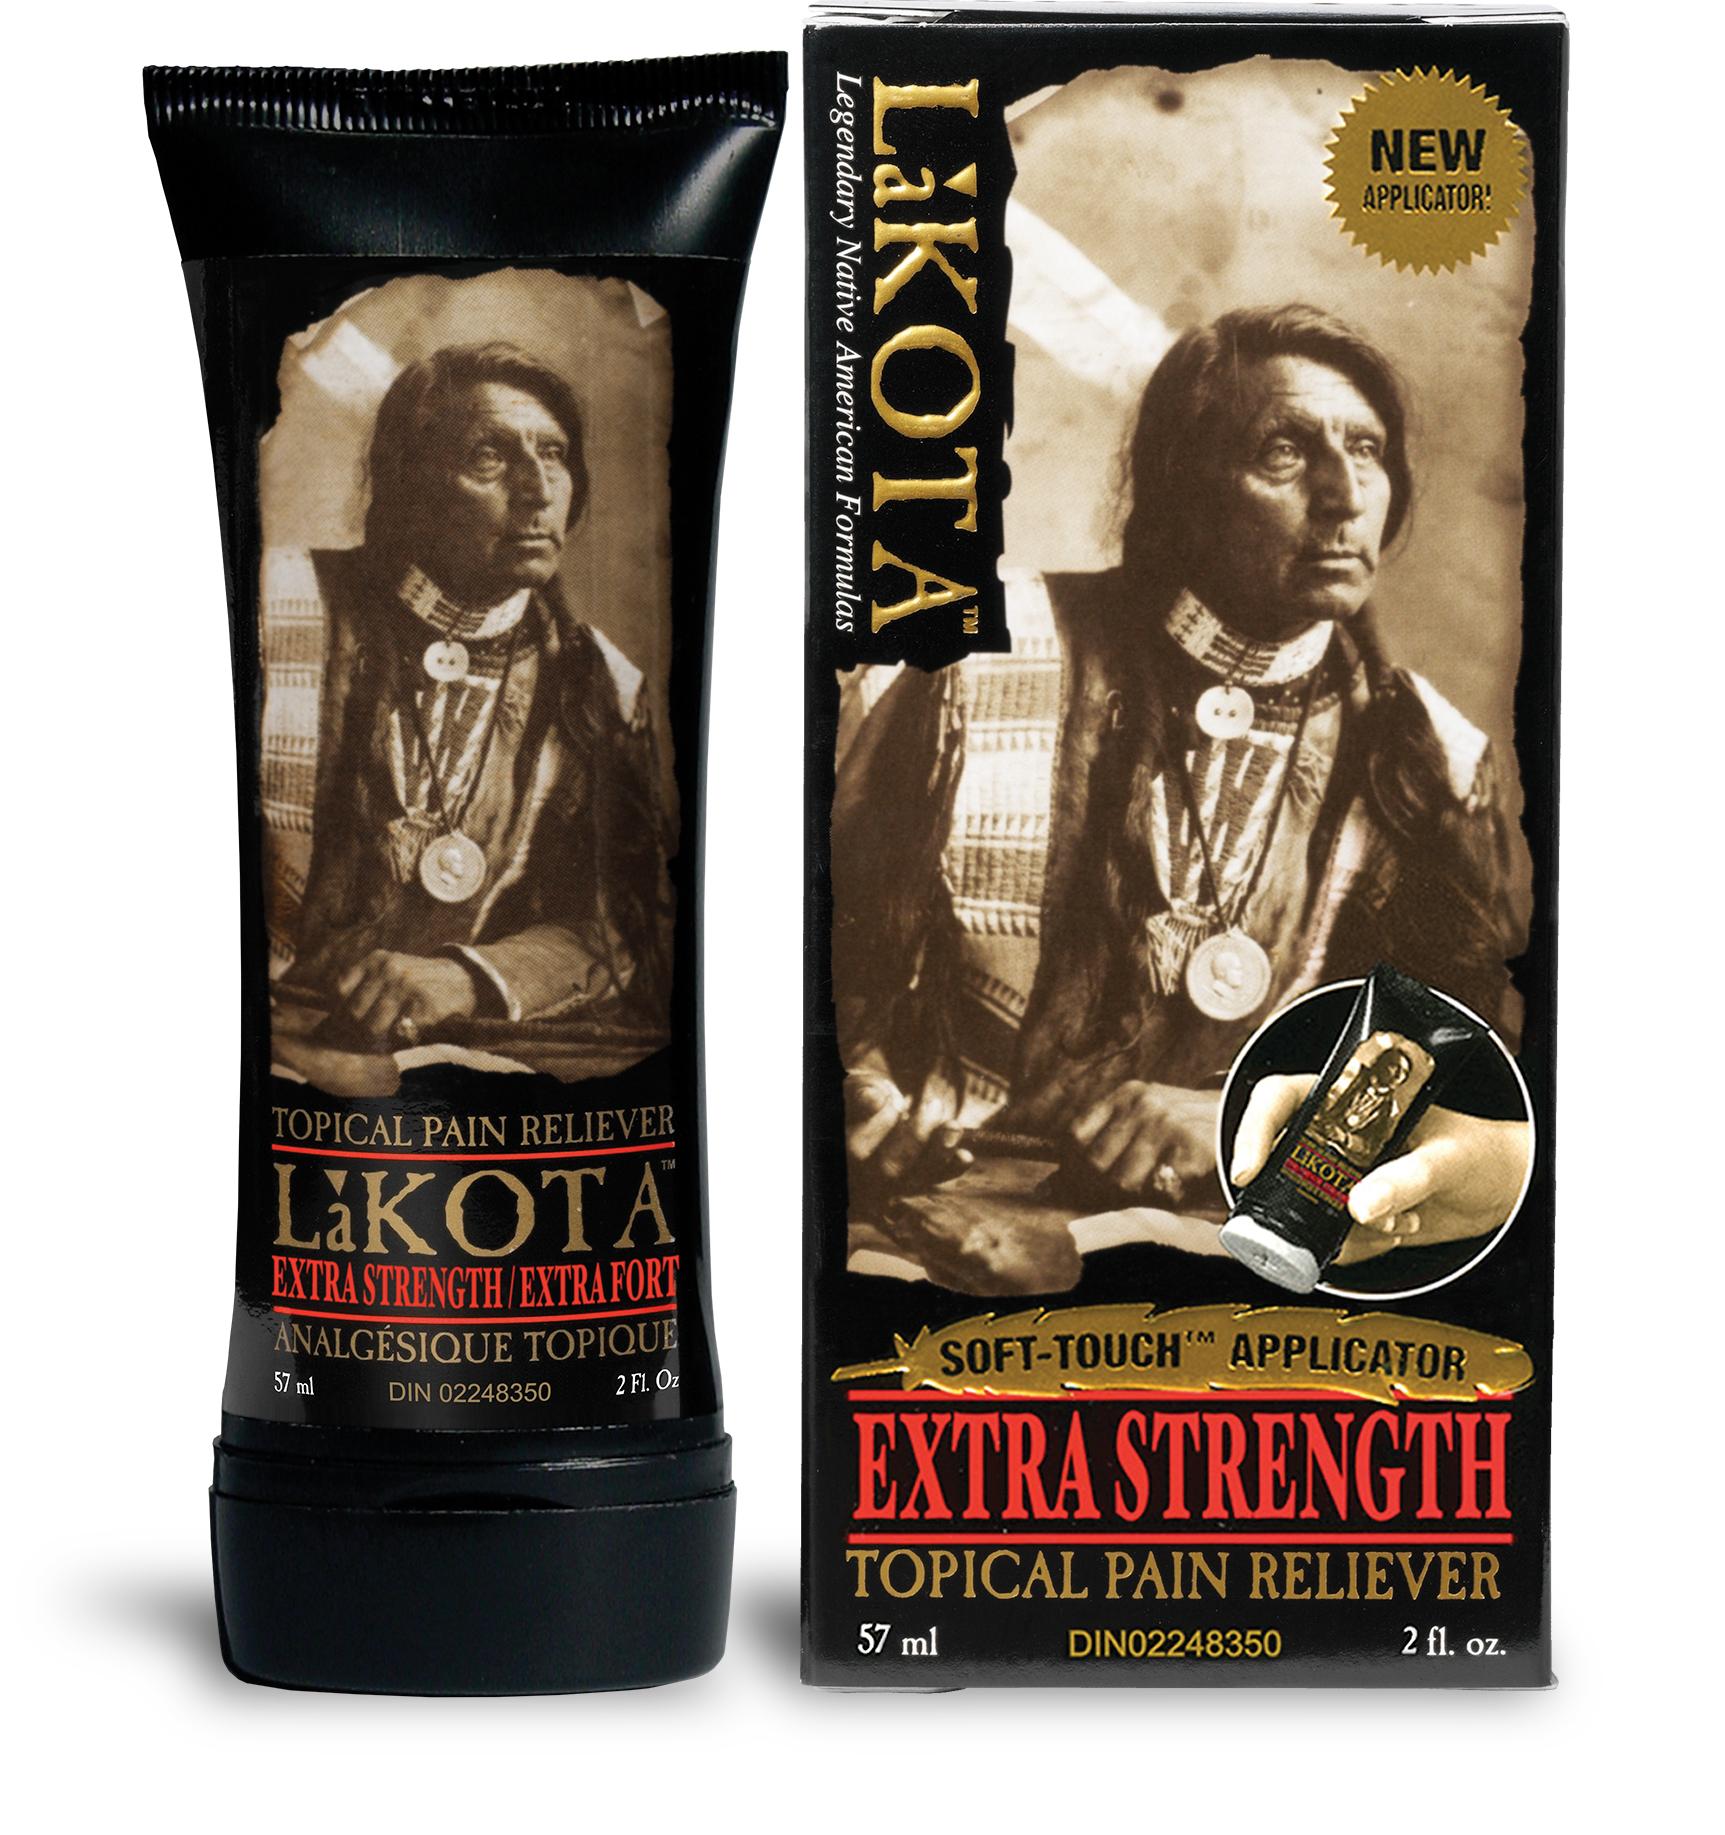 Lakota Xs Pain Relief Soft Touch Applicator 57ml 1 9oz